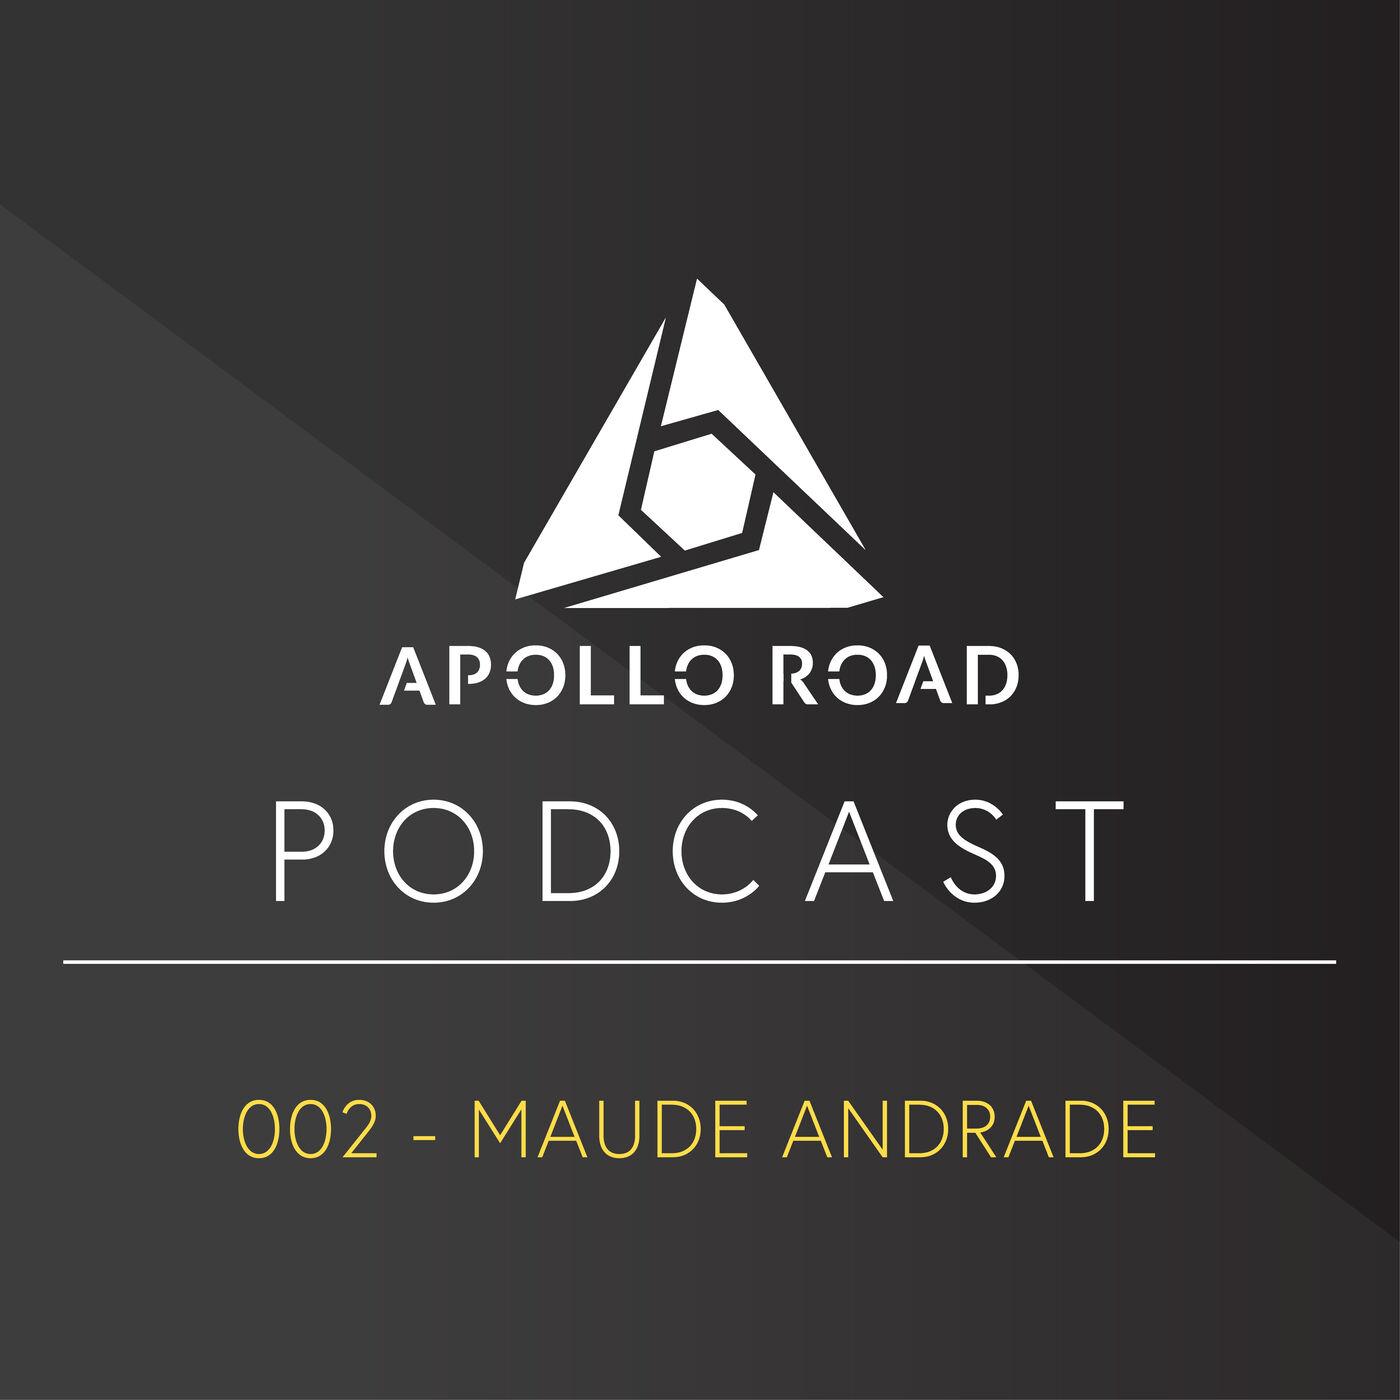 002 - Maude Andrade: Adaptable Creative Process